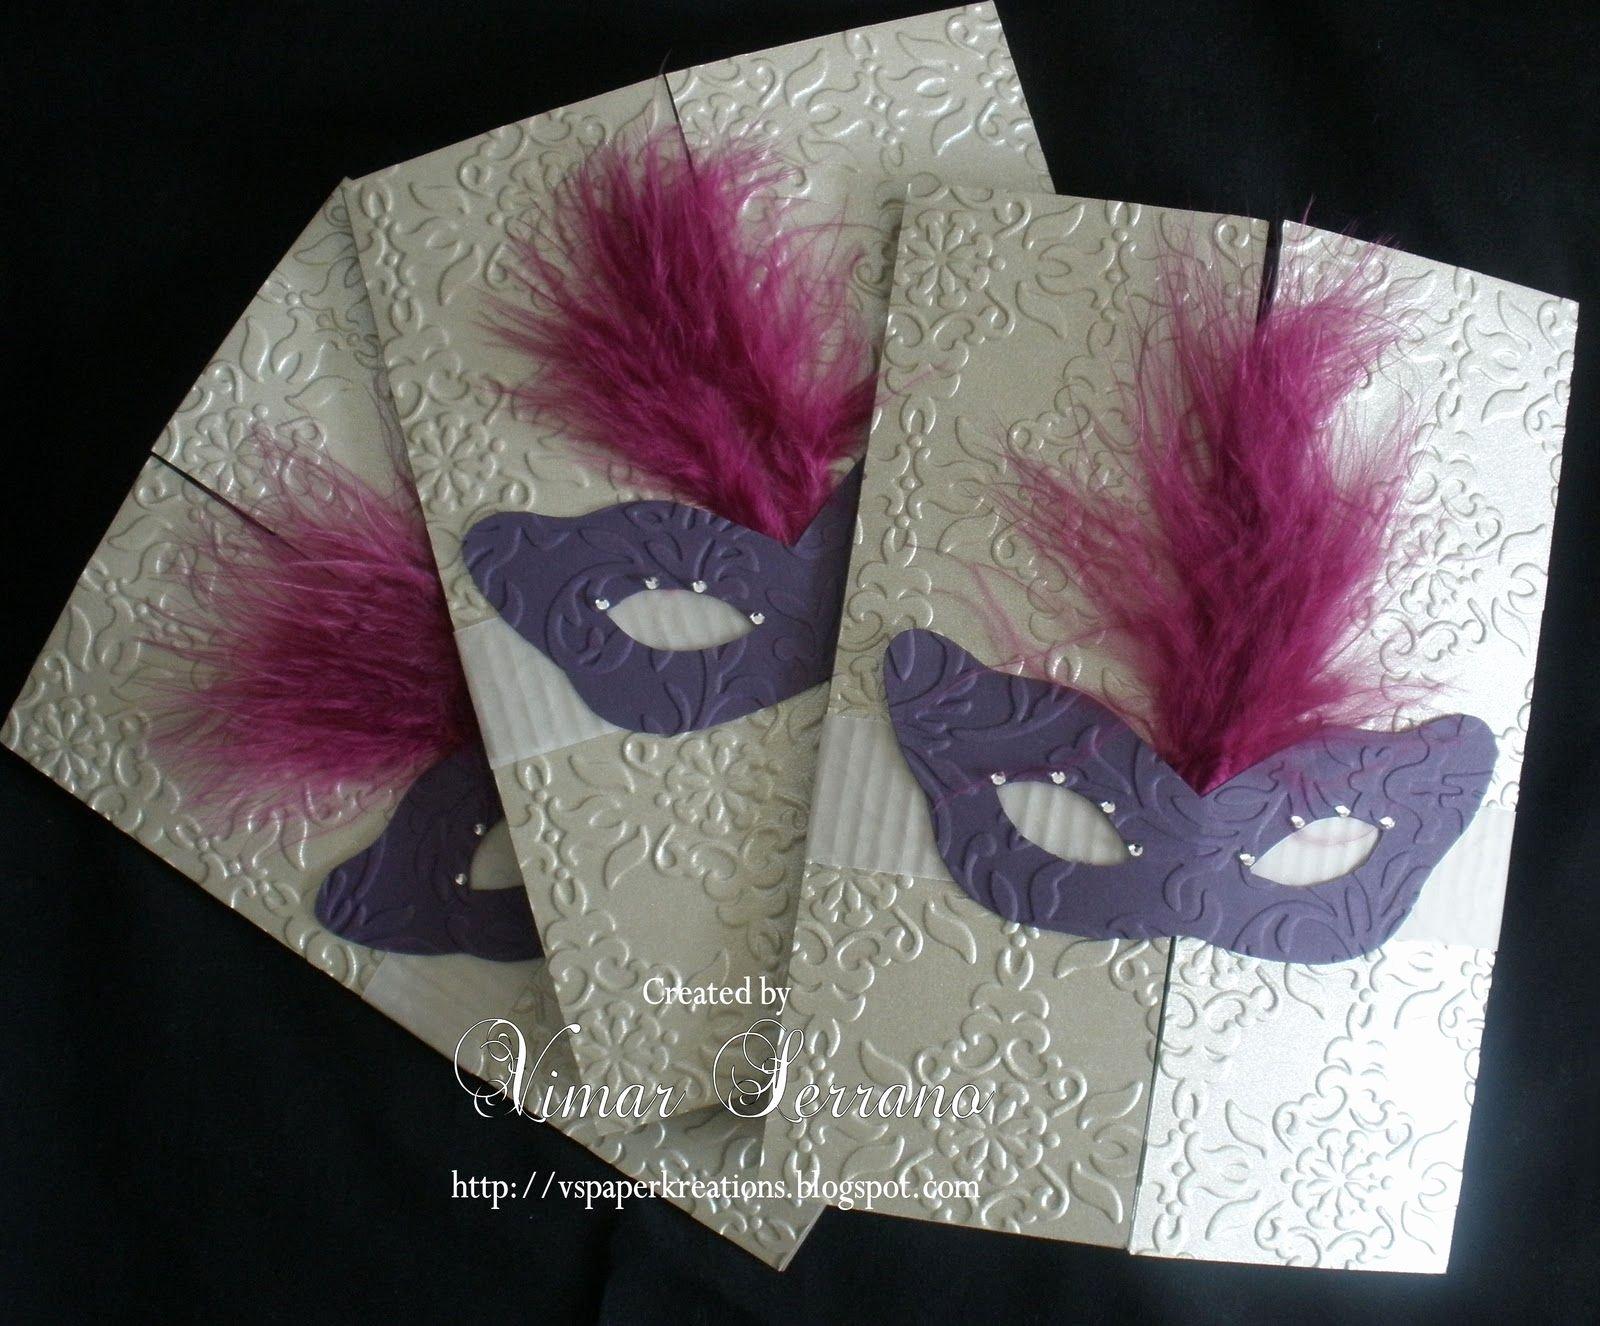 Masquerade Invitations for Quinceaneras Lovely Quinceanera Ideas